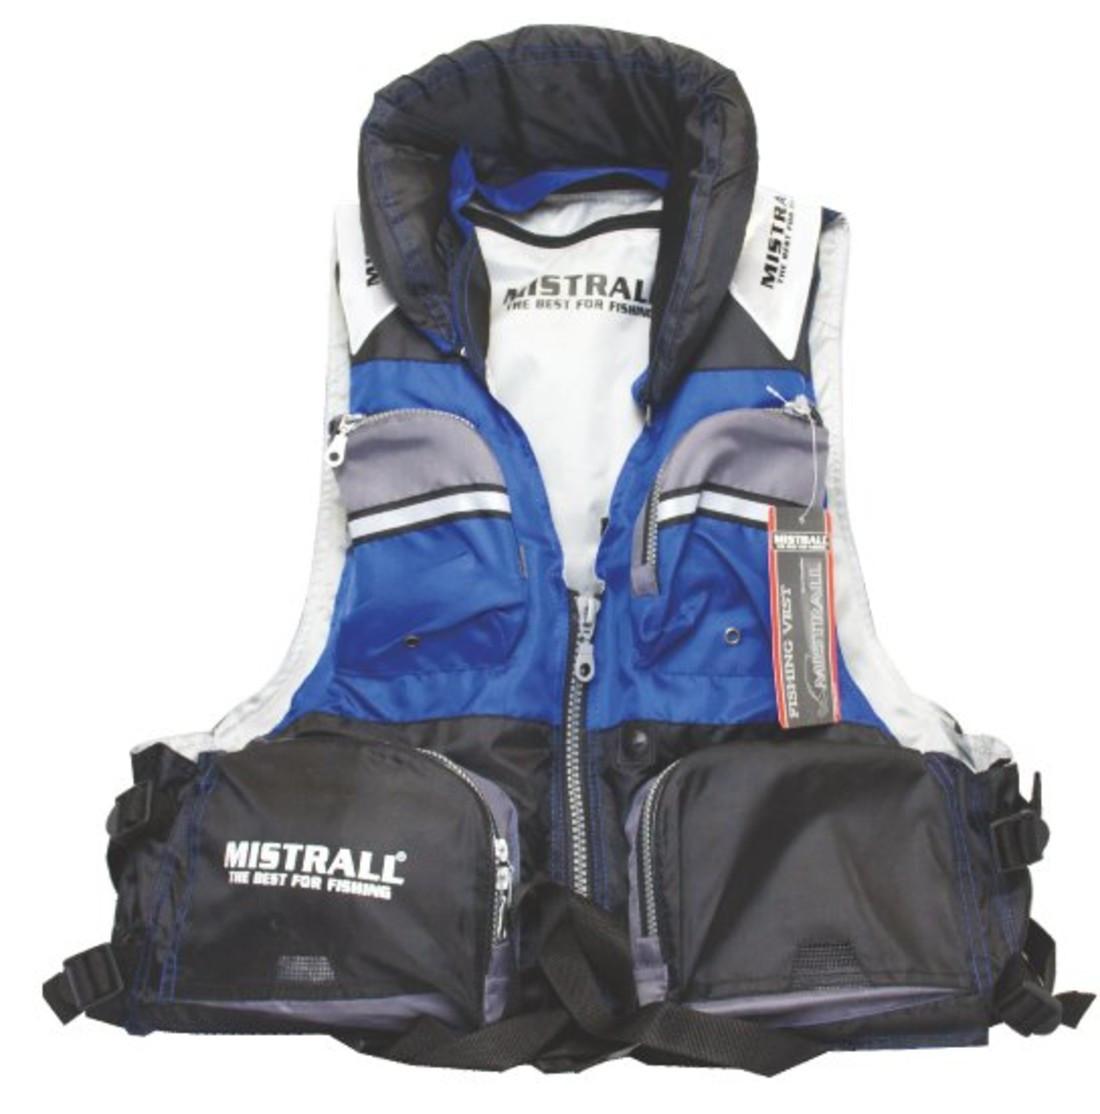 Жилет-разгрузка спасательный плавающий  Х2 BLUE р.L  MISTRALL